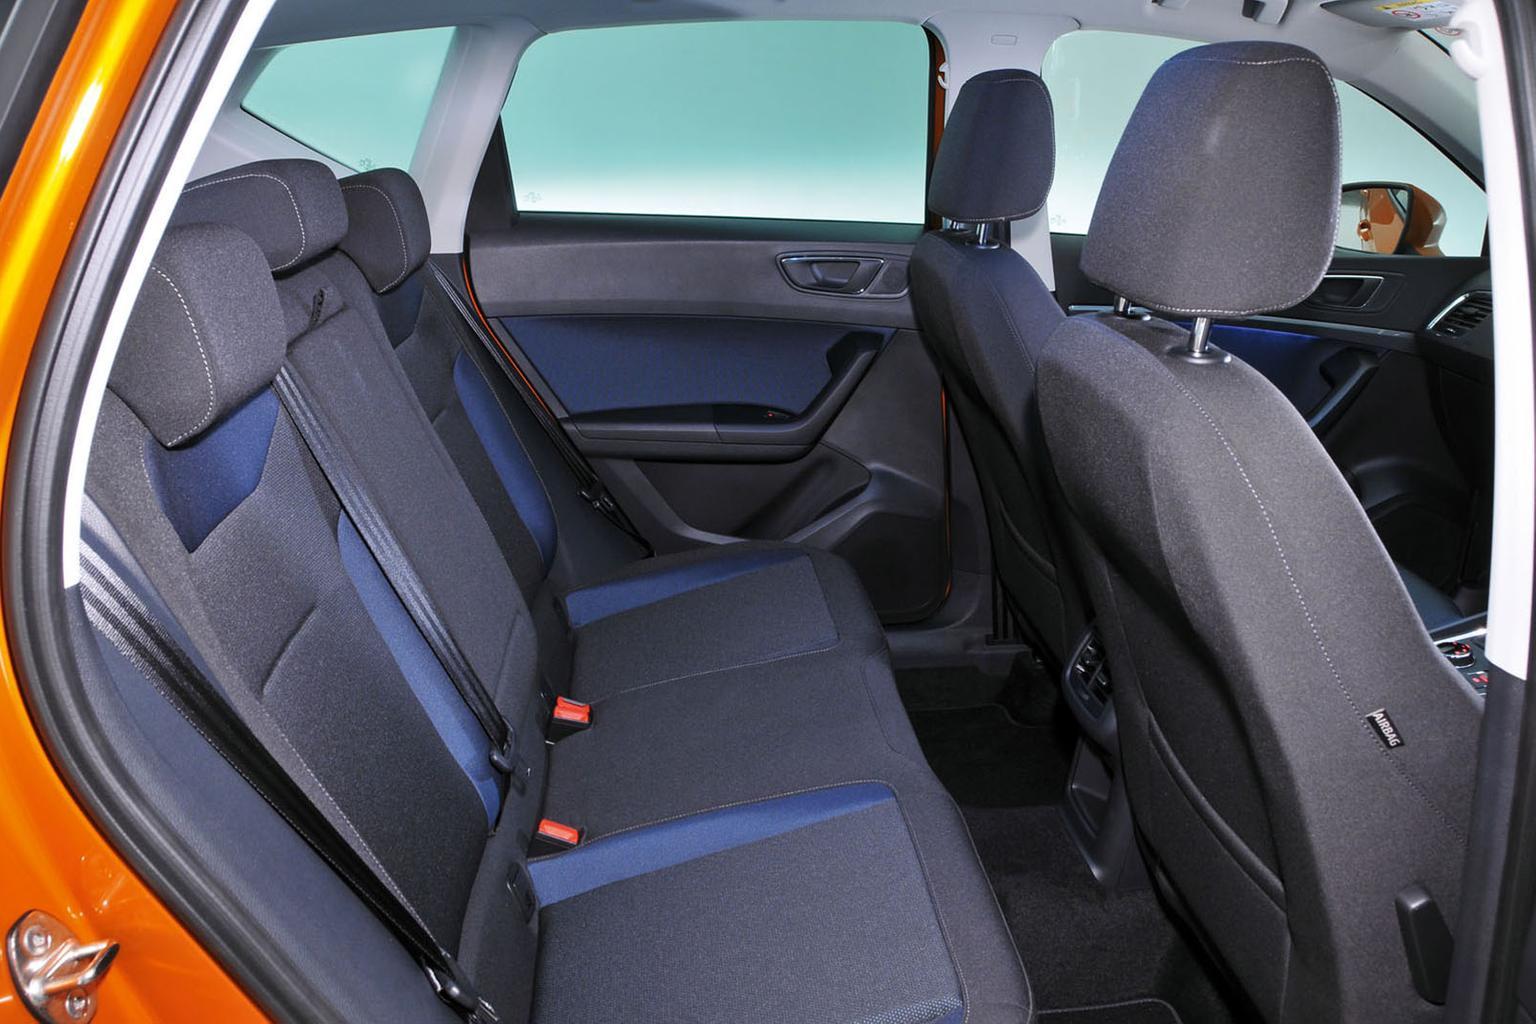 Mini Countryman vs Audi Q2 and Seat Ateca